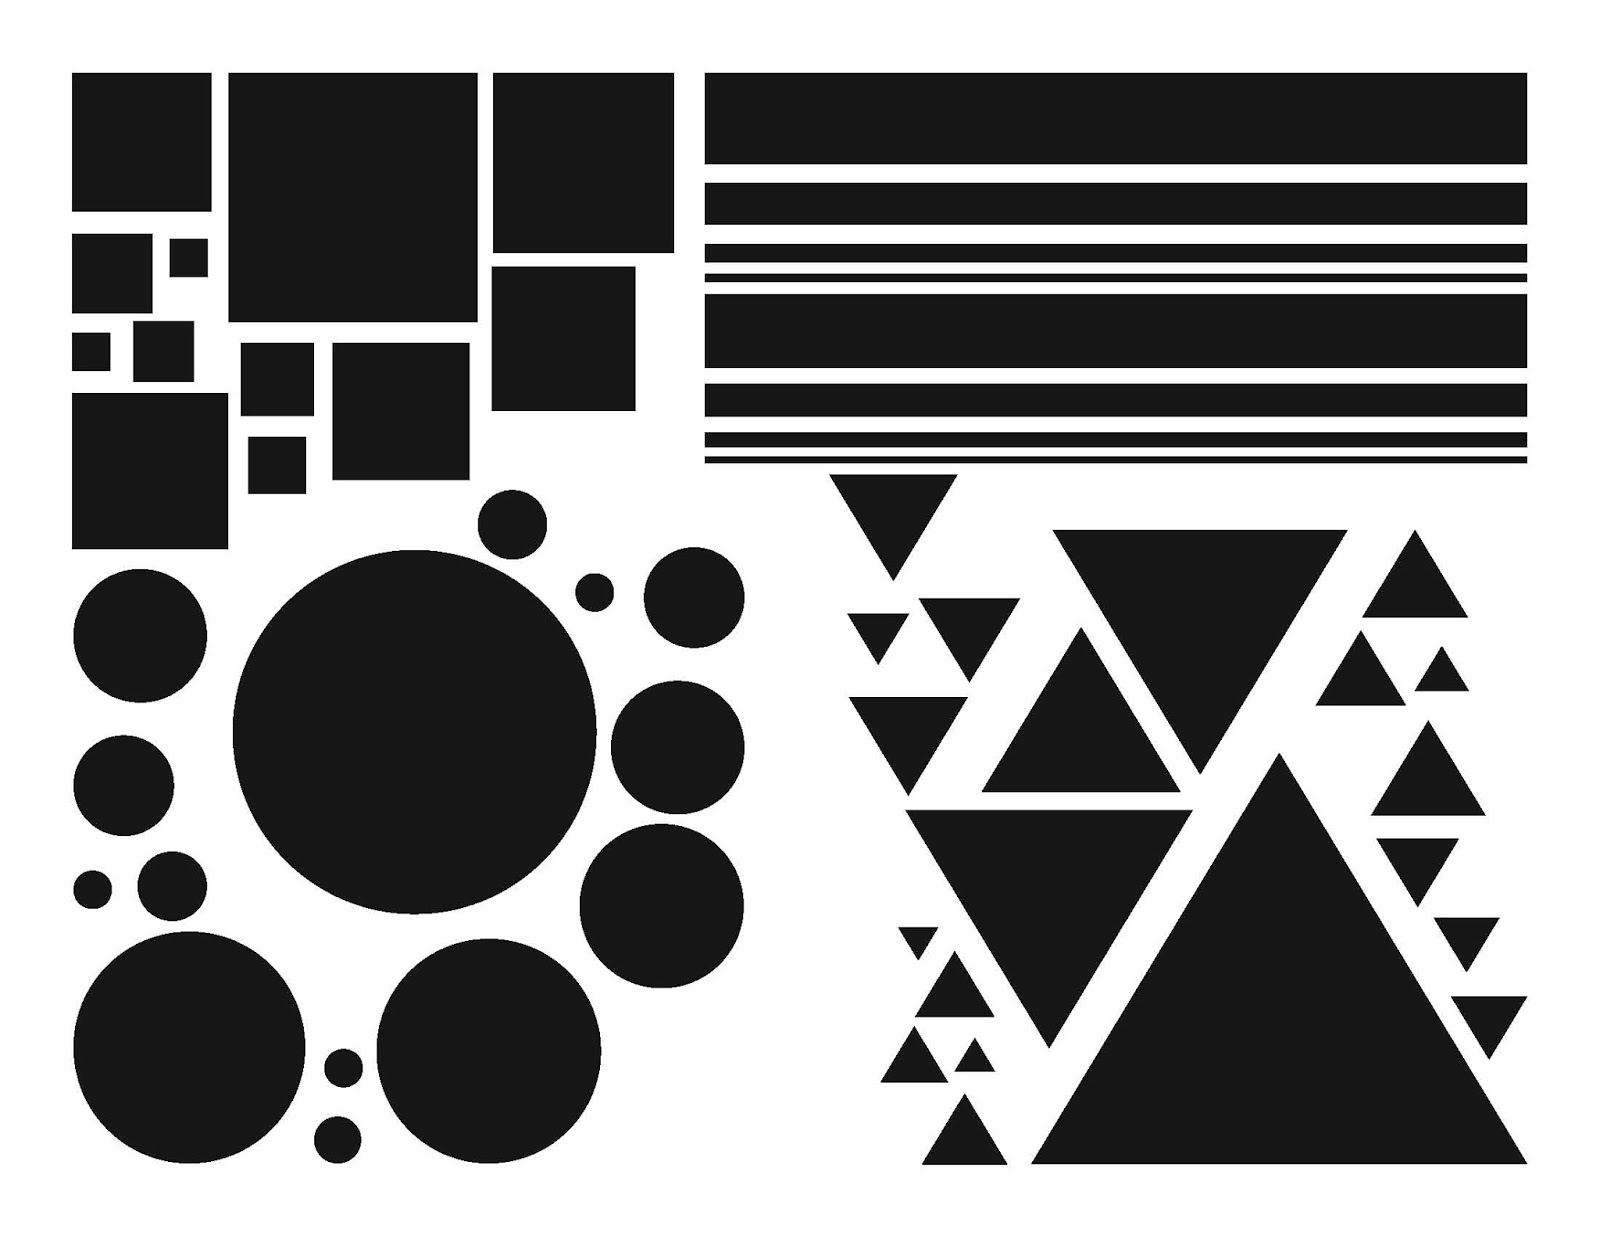 Basic Design And Visual Arts : Mc school art graphic design cut paste basic compositions